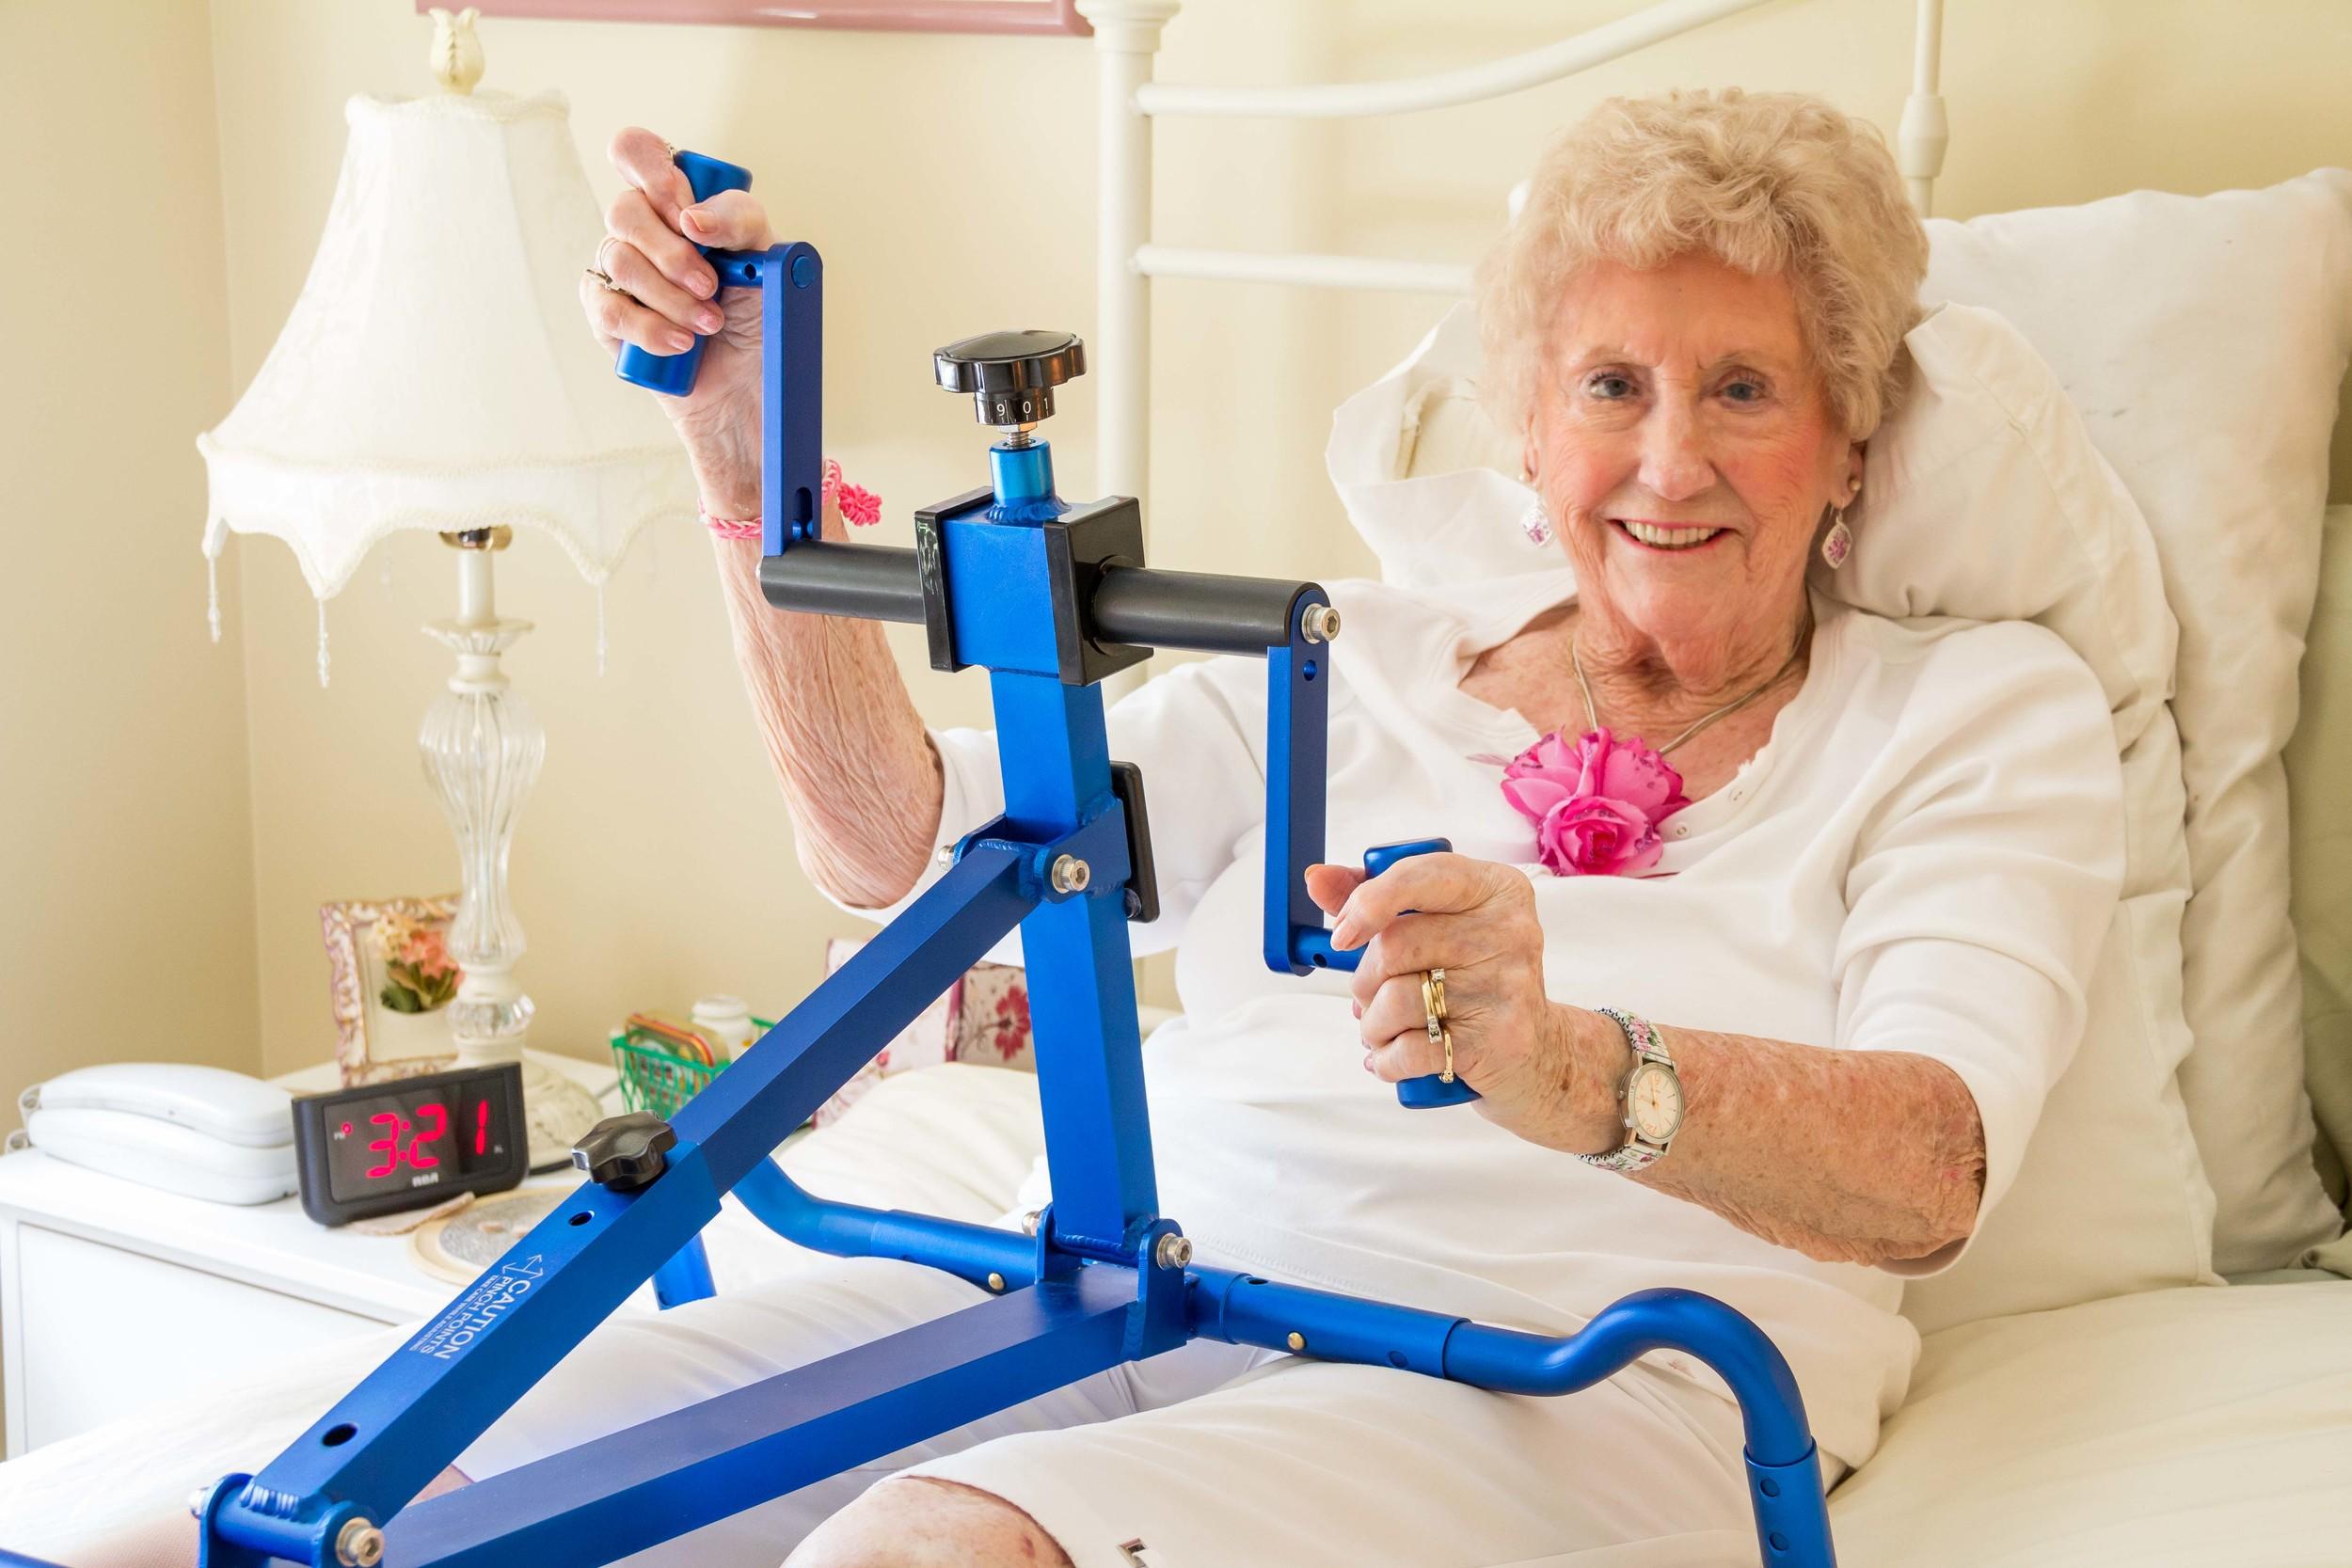 Senior woman using BedBike, a portable arm ergometer